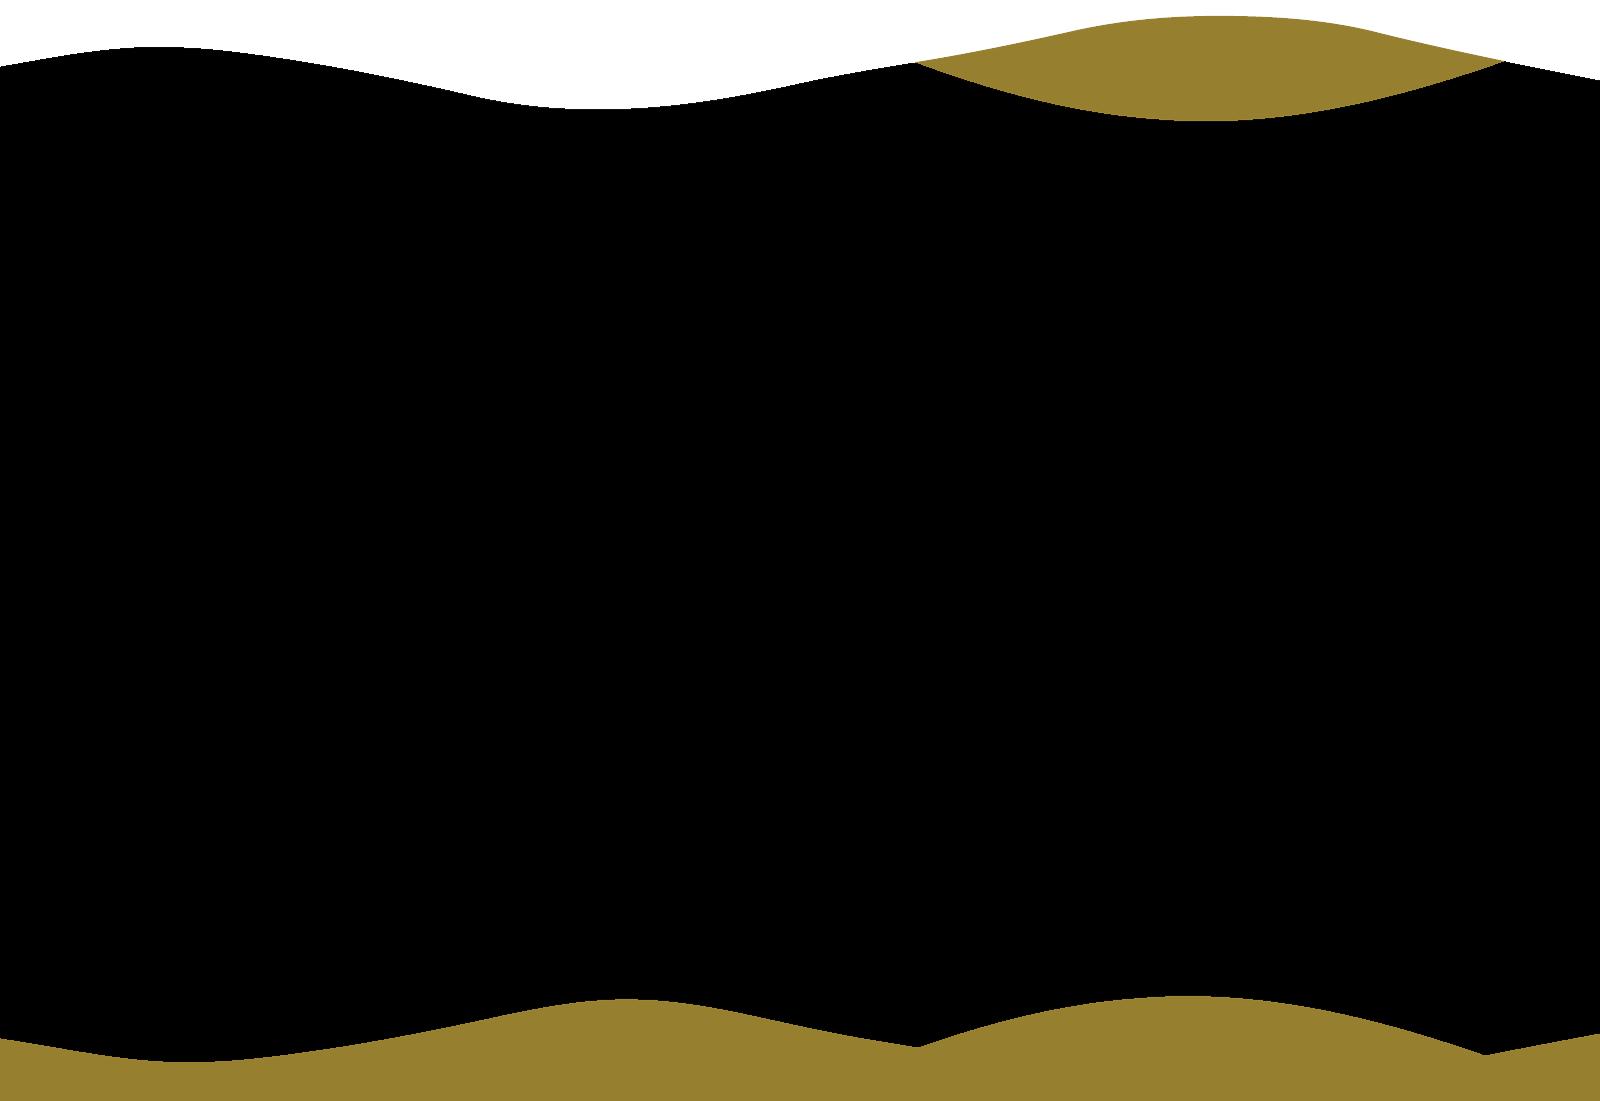 curves-brown-white-1600-3